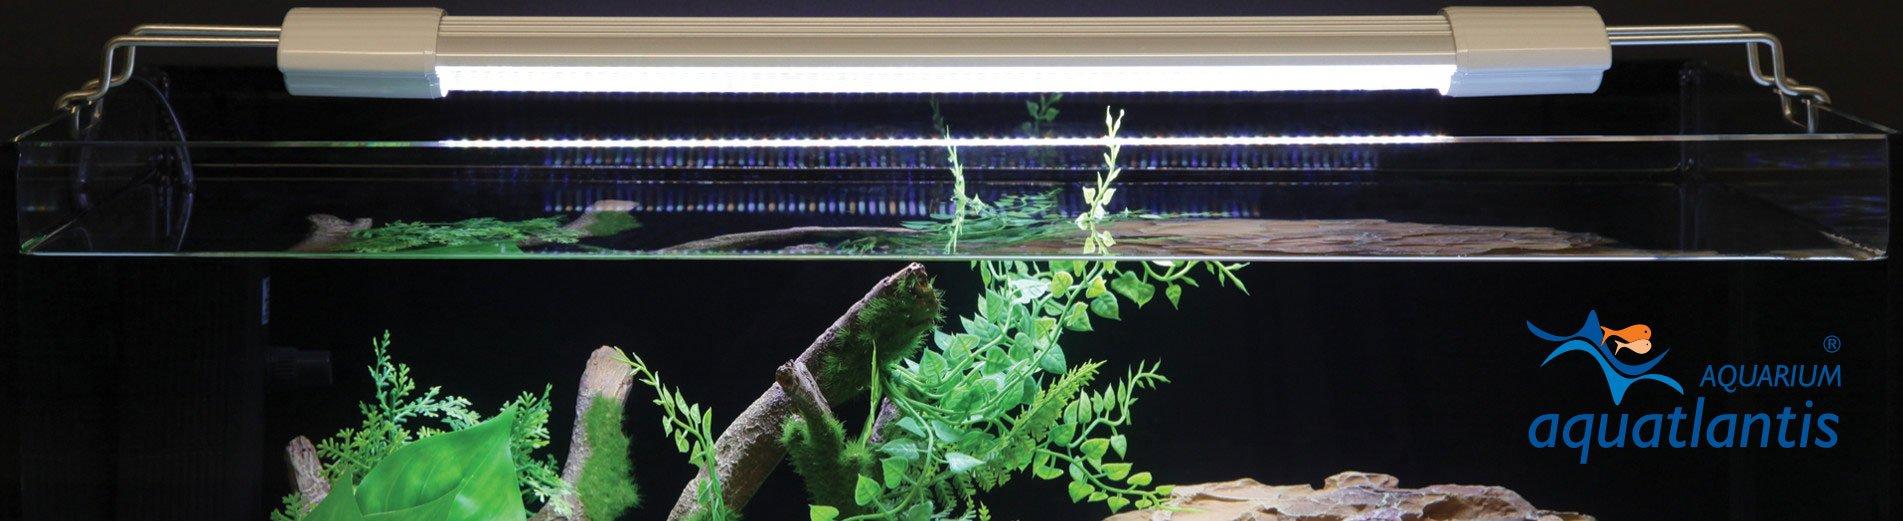 Aquarium LED Beleuchtung